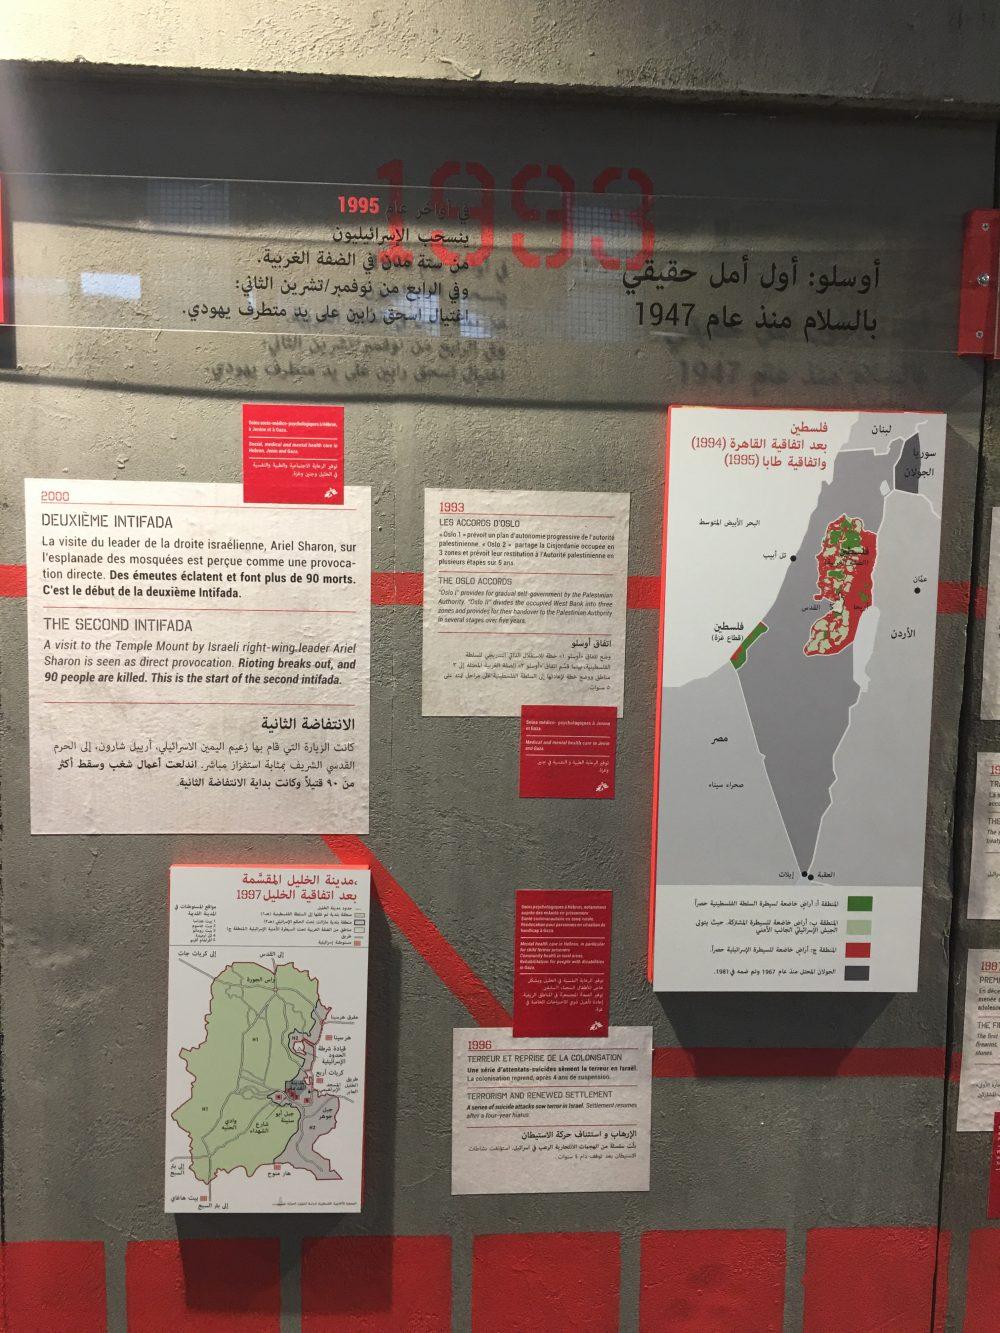 The Oslo peace accords